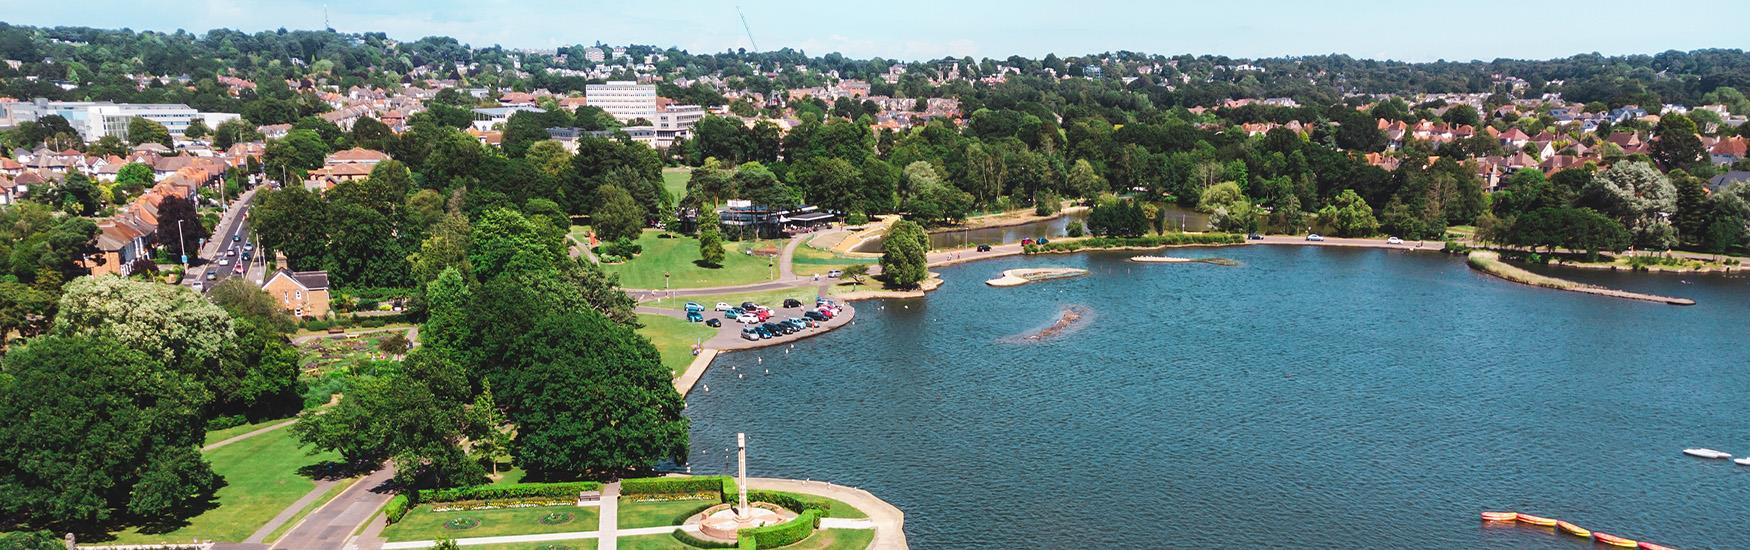 Stunning views at Poole Park